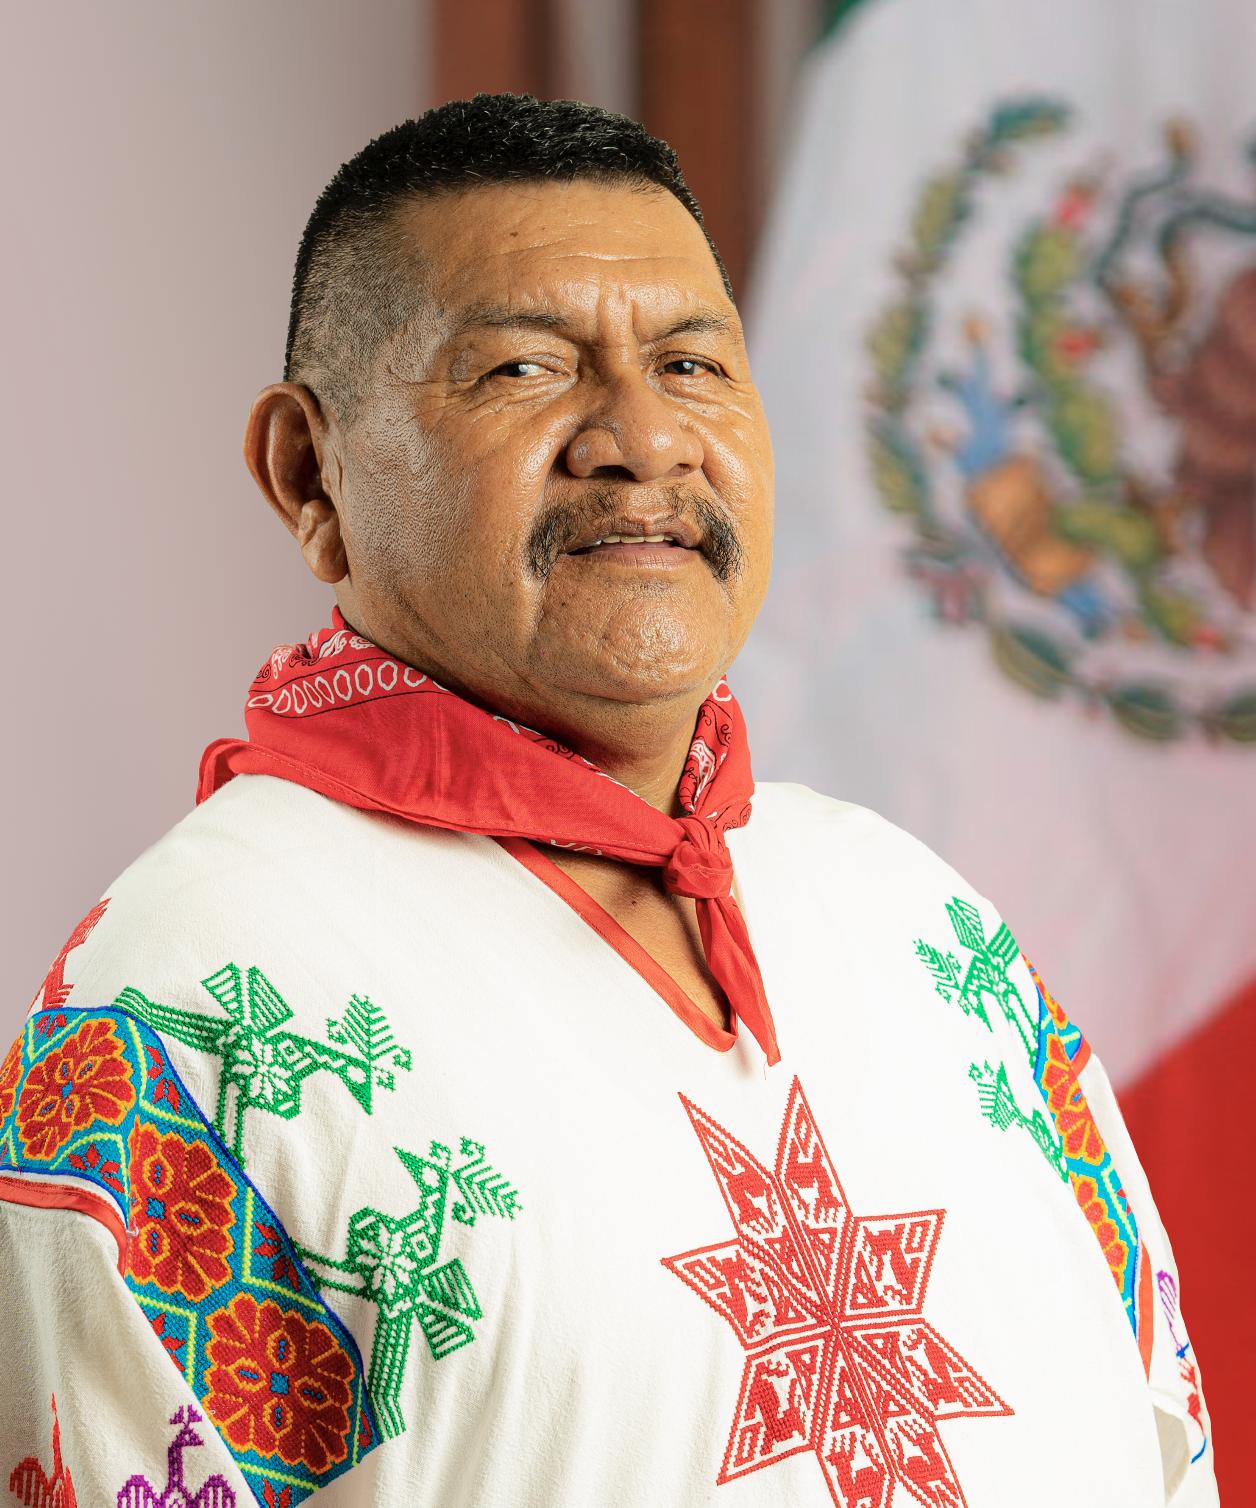 C. Jose Salvador